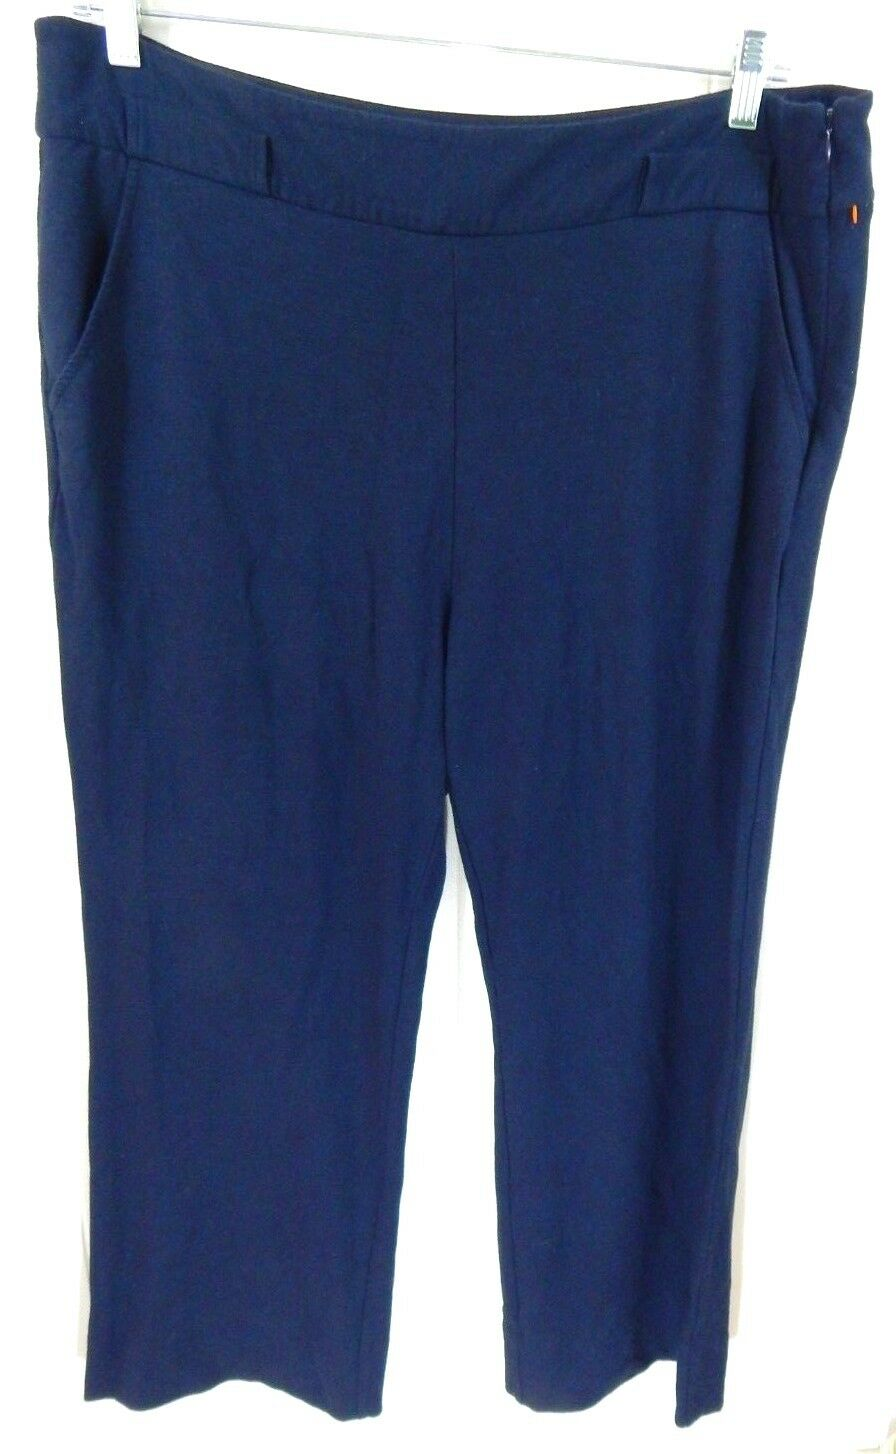 Cabi Women's 16 Pants Easy Crop Navy Knit High Waist Spring 2017 EUC